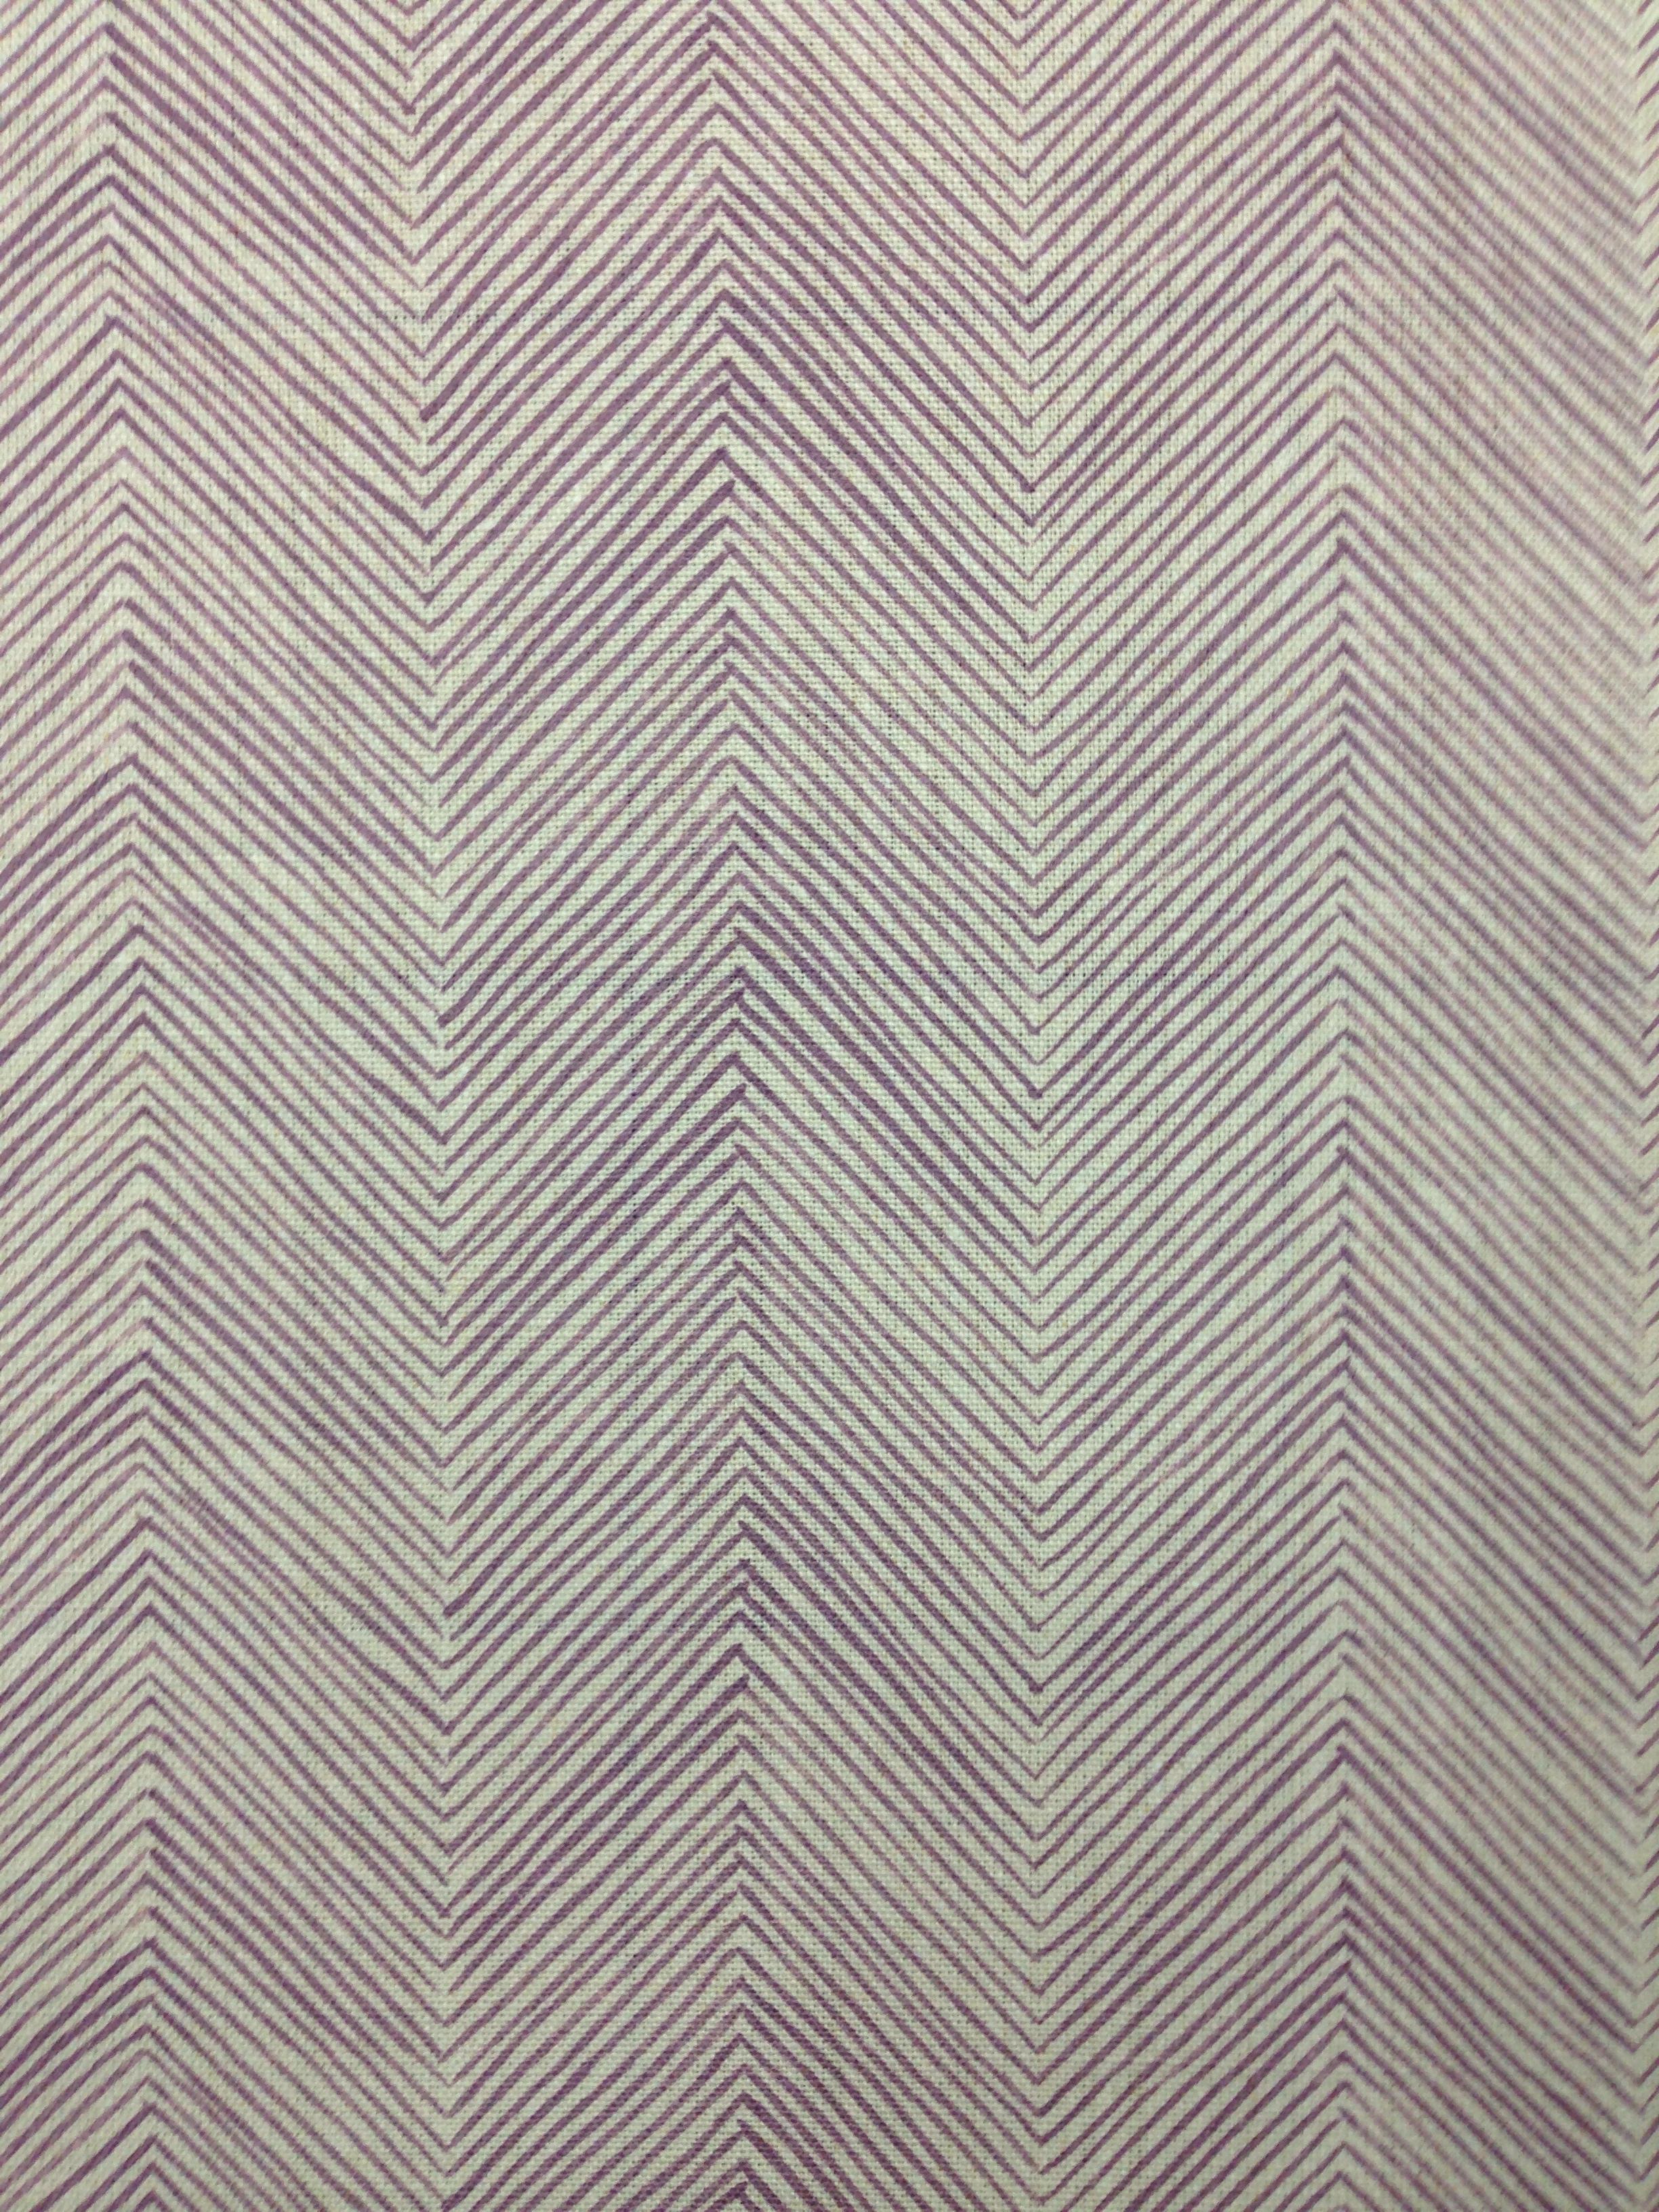 herringbone parma violet